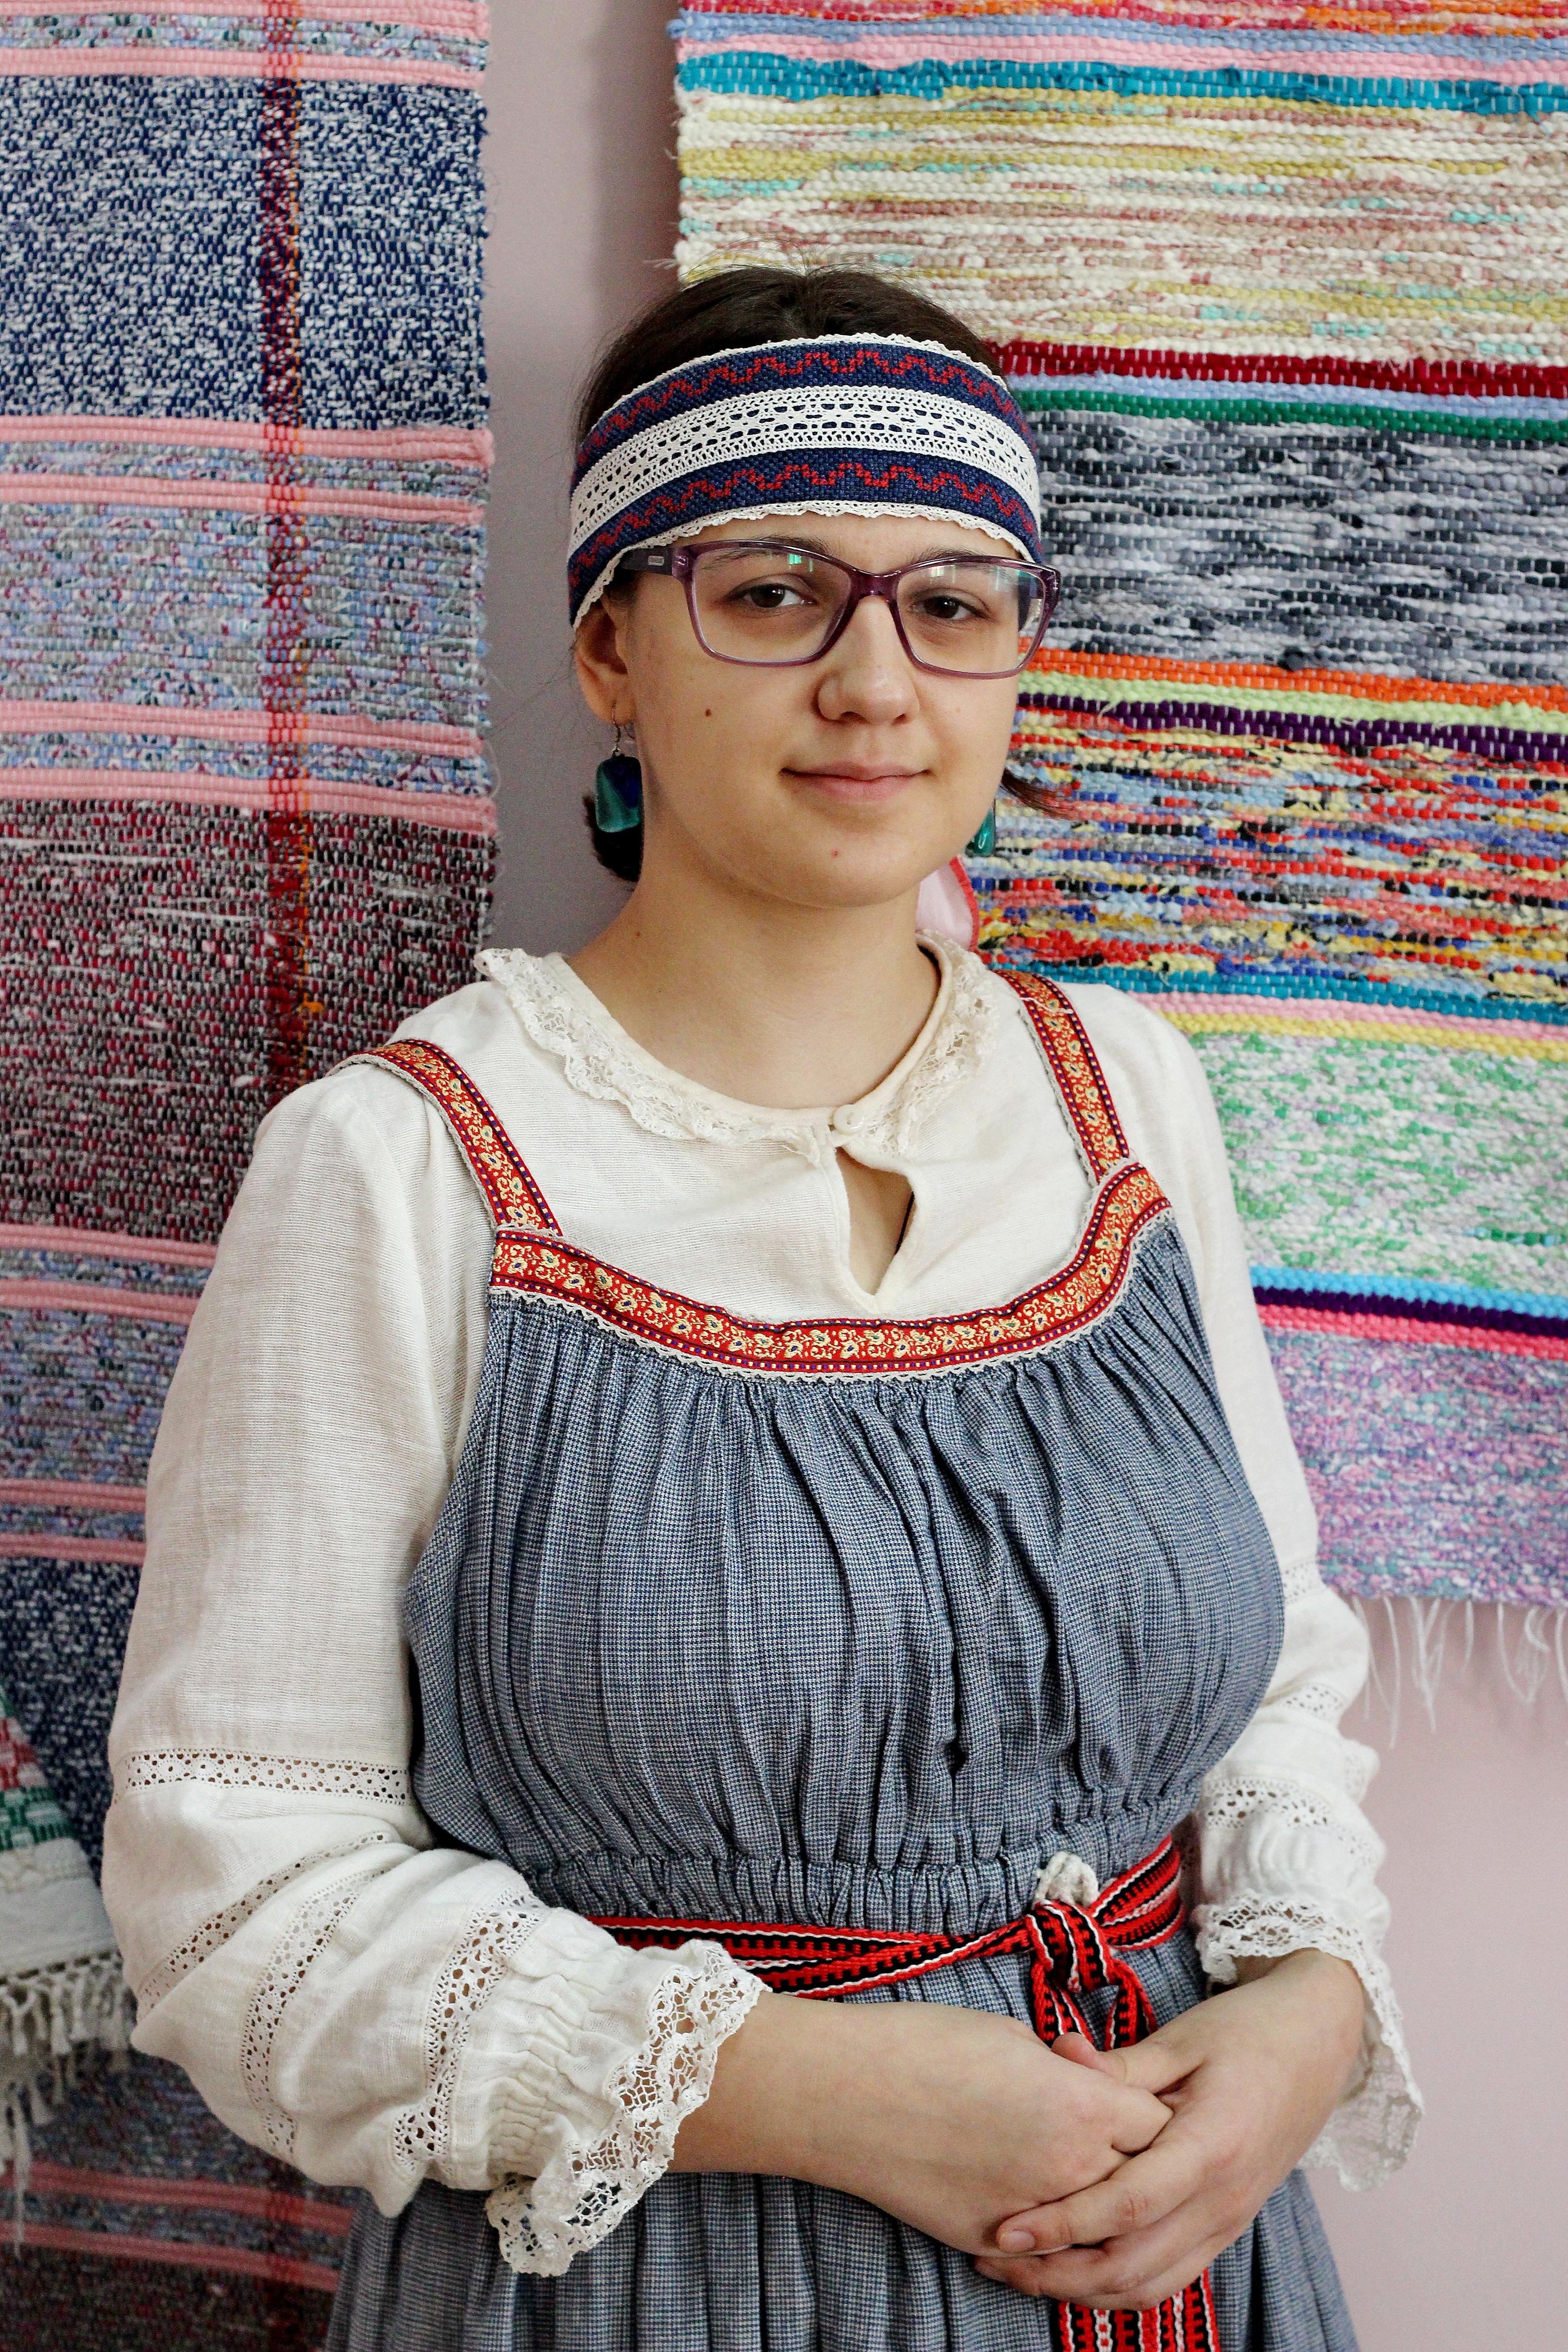 Пронякина Елизавета Алексеевна